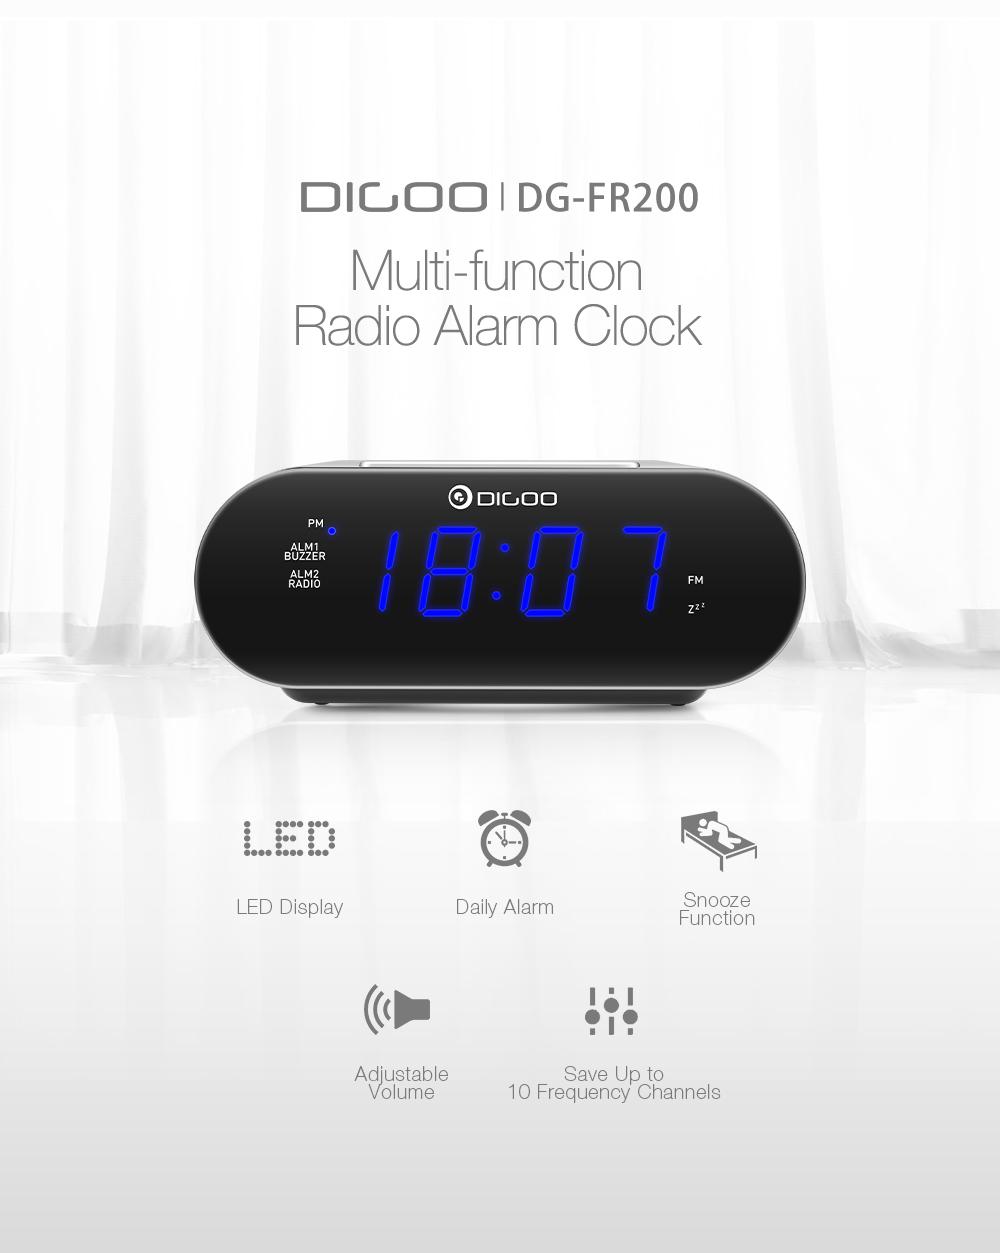 [2019 Third Digoo Carnival] DIGOO DG-FR200 Smart LED Digital Display Alarm  Clock with FM Radio Adjustable Volume Dual Daily Alarms